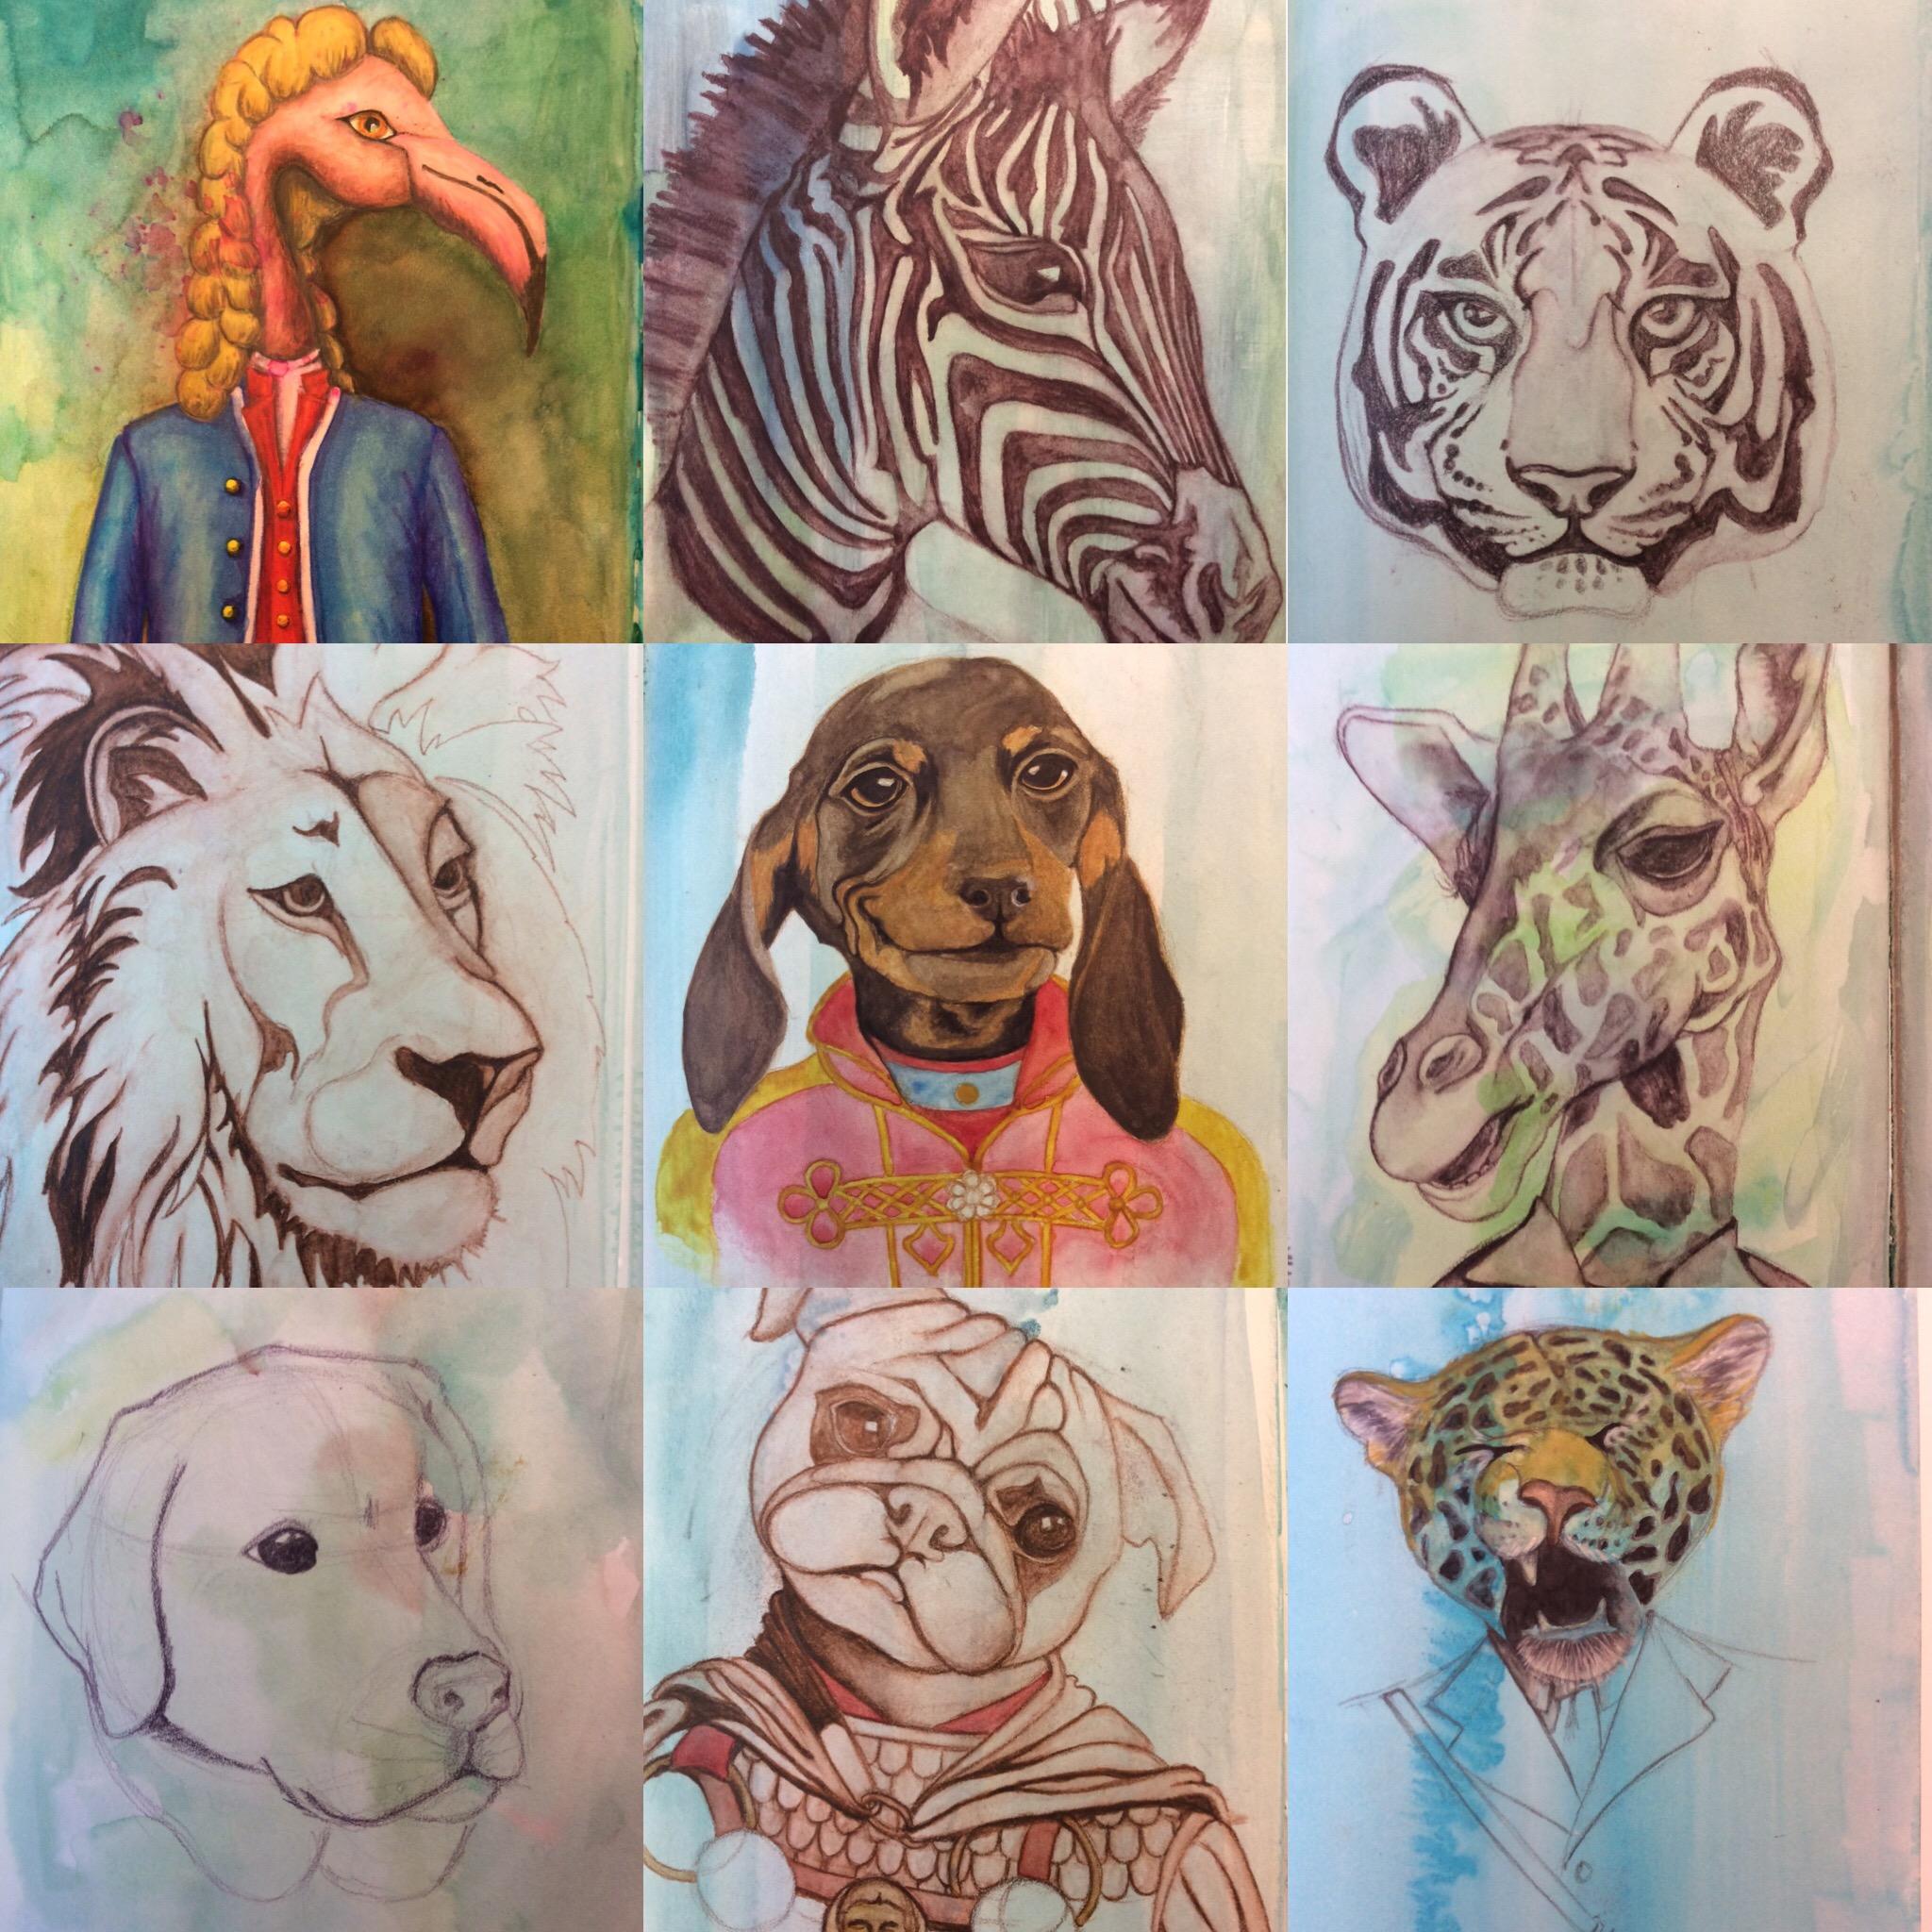 Anthropomorphism, Zebra, Tiger, Dog, Flamingo, Historical, Watercolour, Mixed Media, Watercolor, Sketchbook